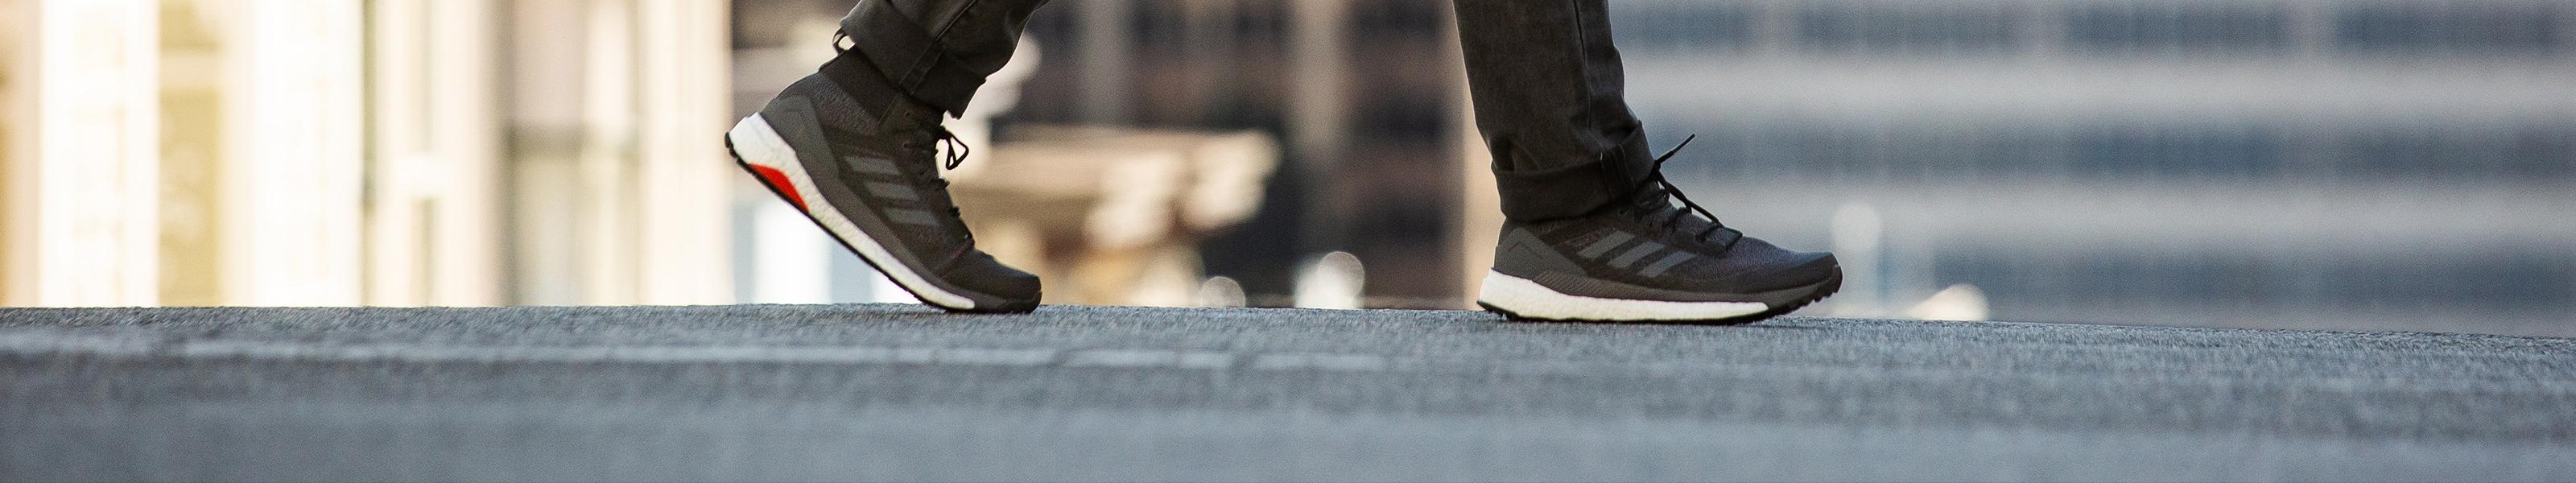 Header adidas 01 1902.jpg?ixlib=rails 2.1